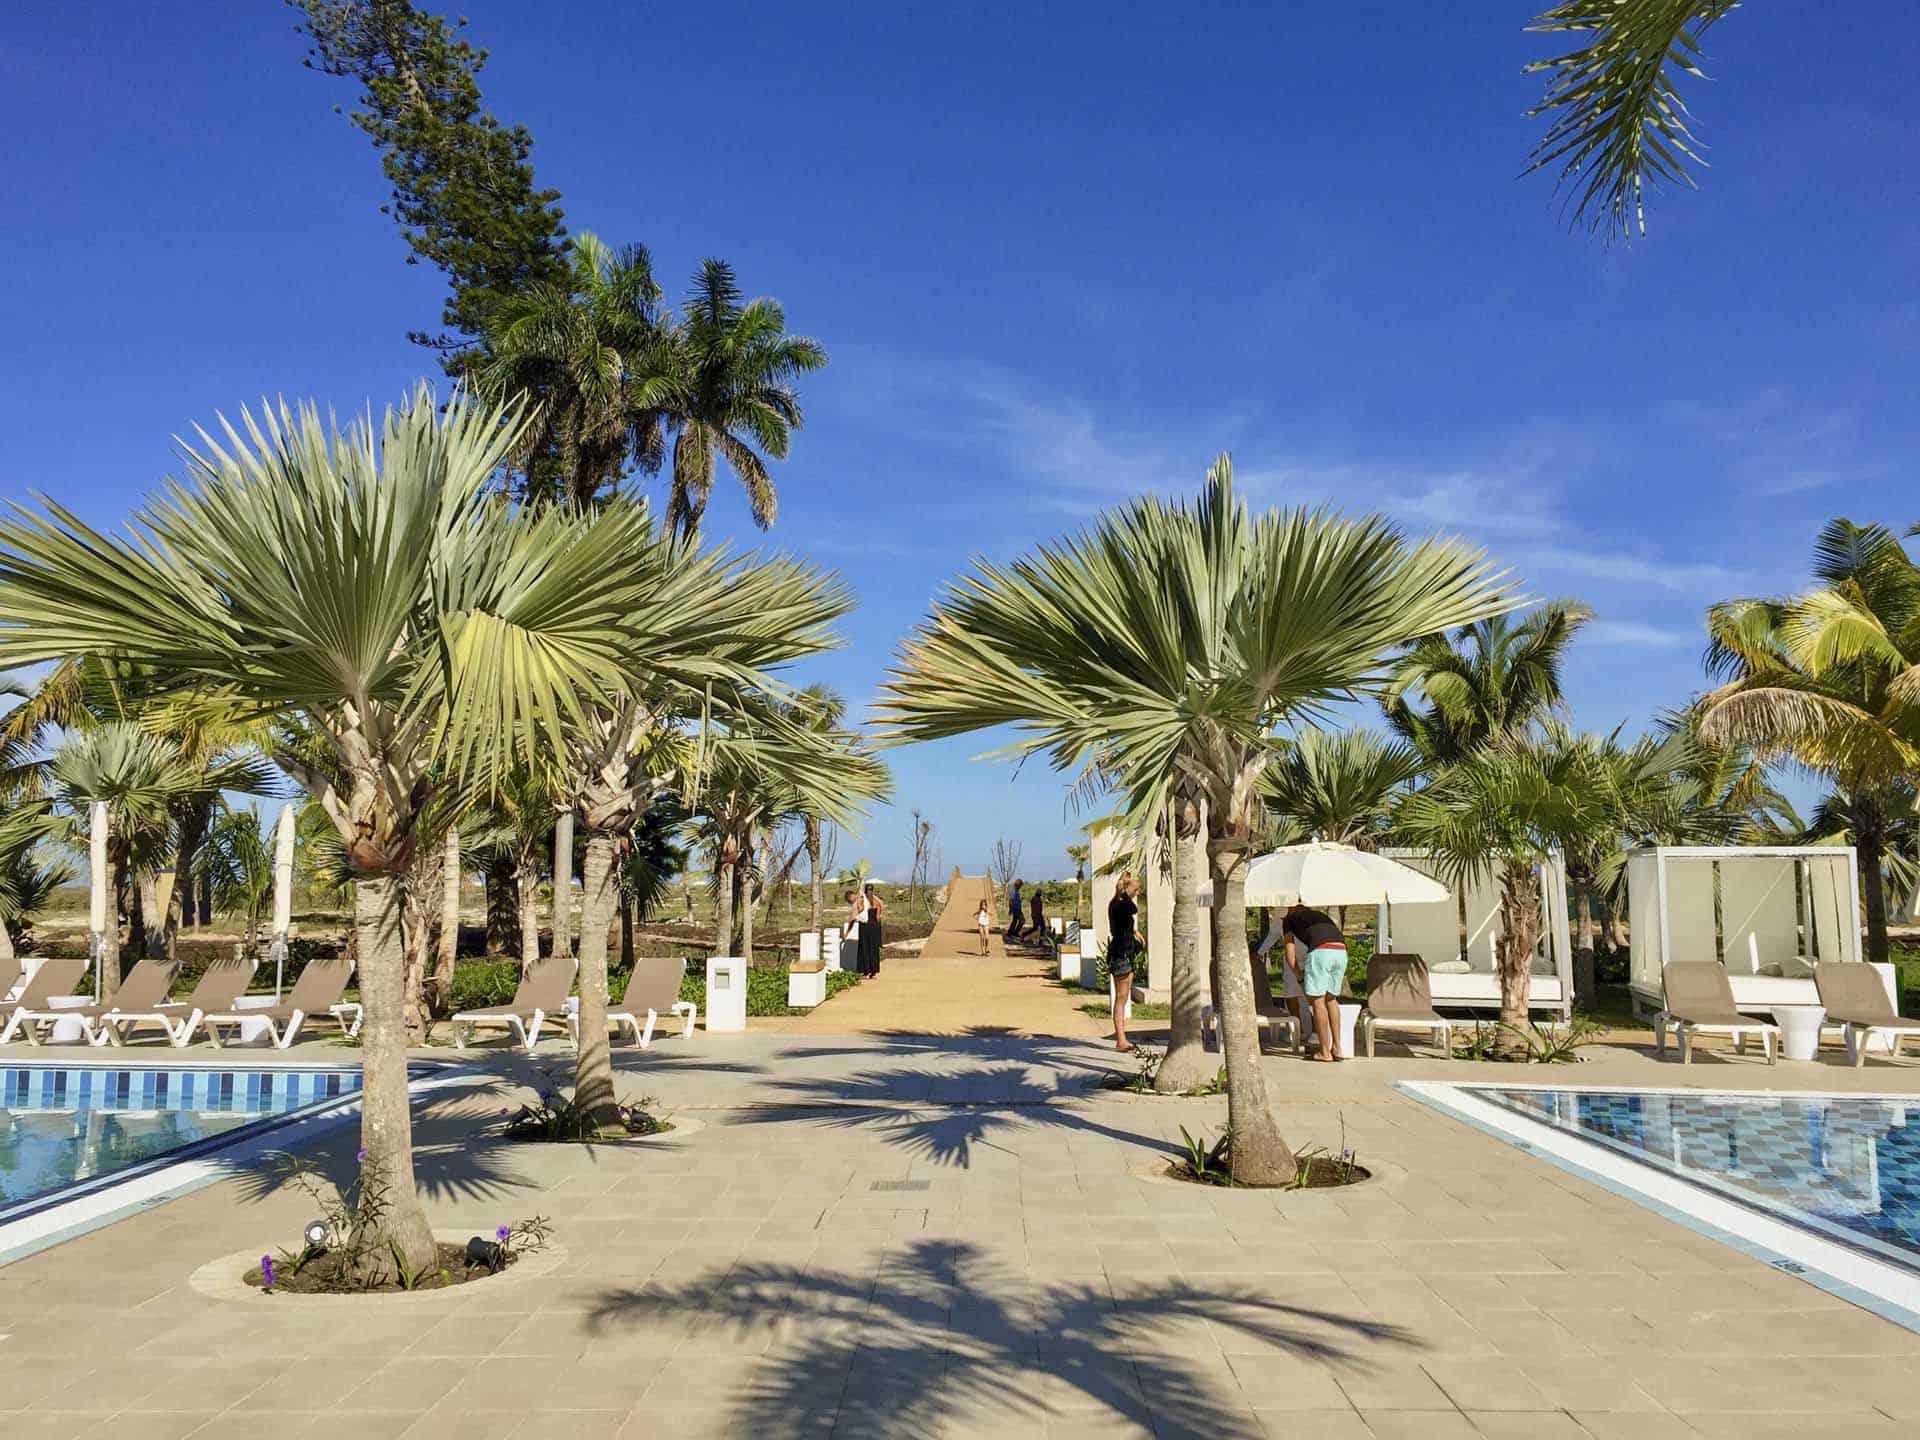 varadero hotel piscine cuba autrement 1